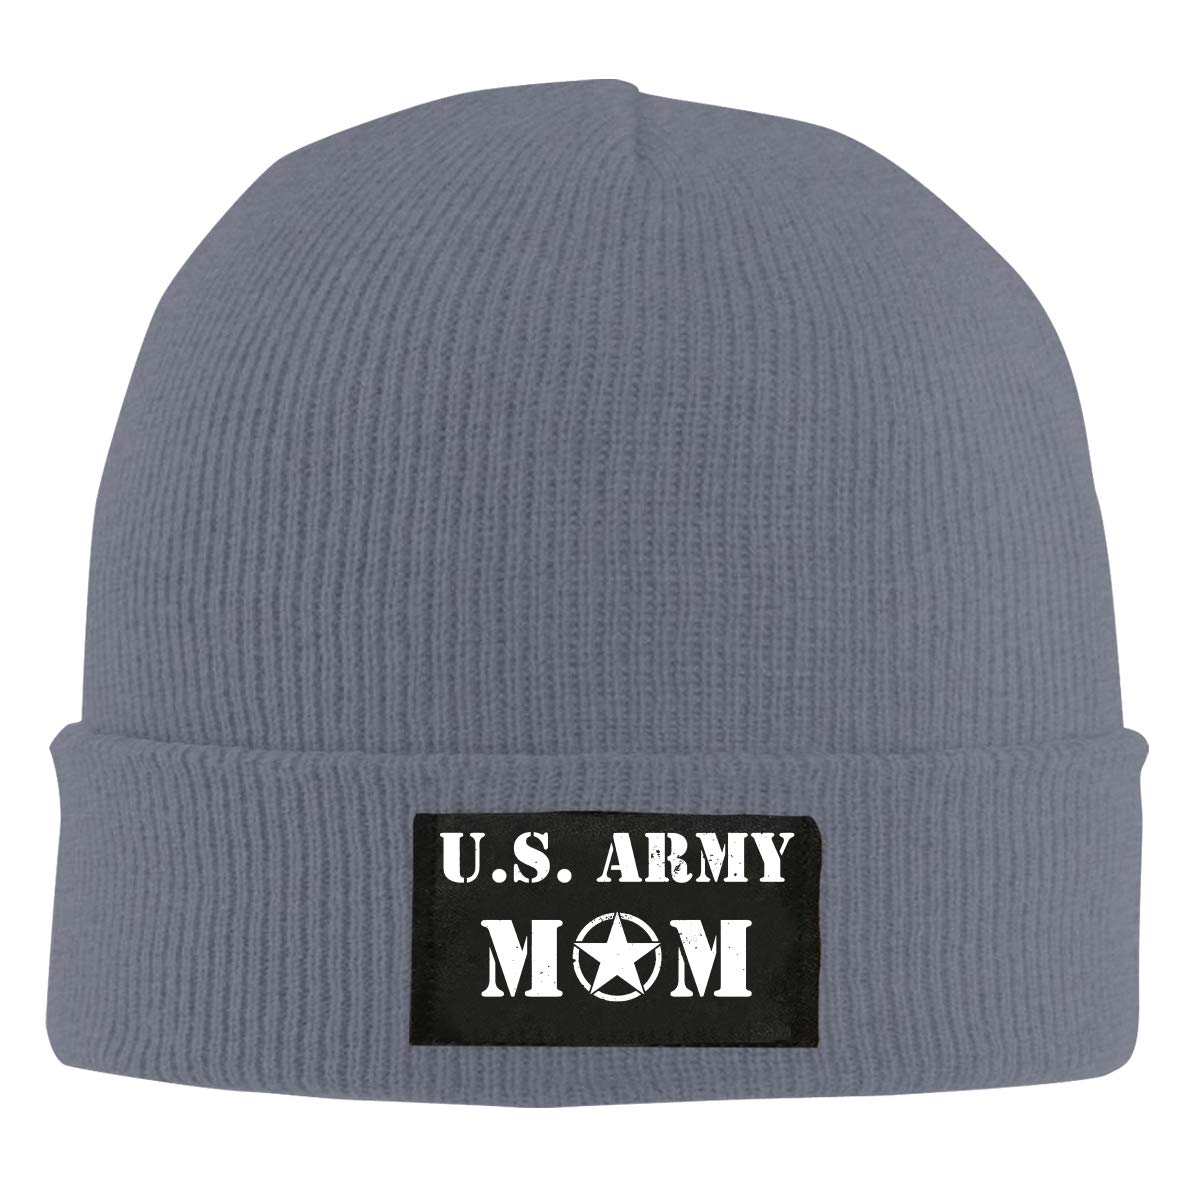 Men Women US Army MOM Skull Hat Beanie Cap Winter Knit Hat Cap